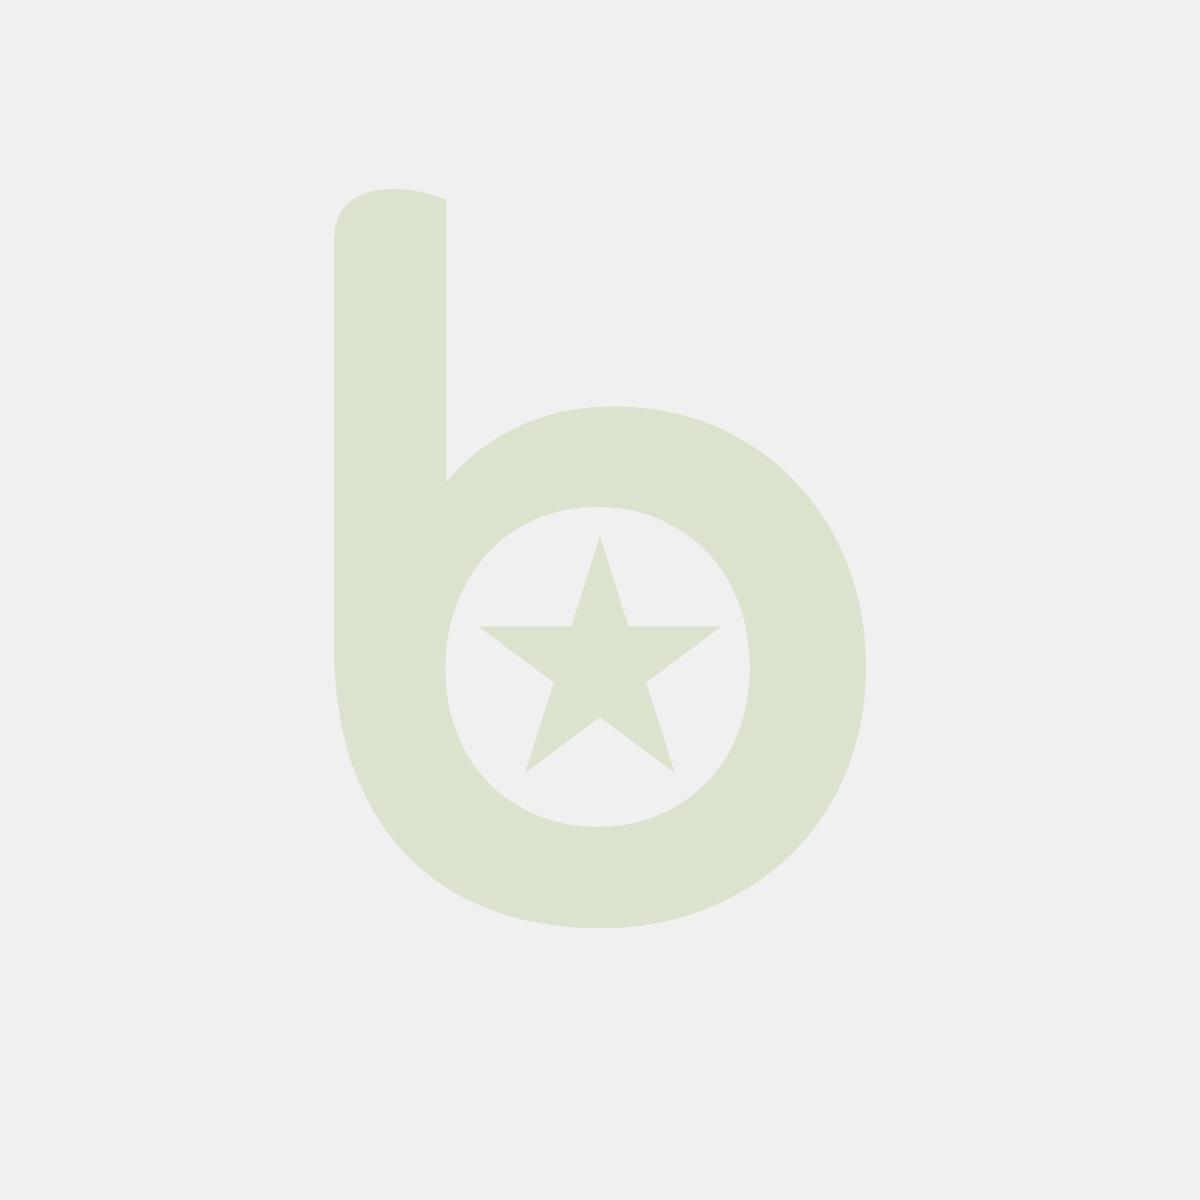 Antyrama DONAU, pleksi, A12, 130x180mm